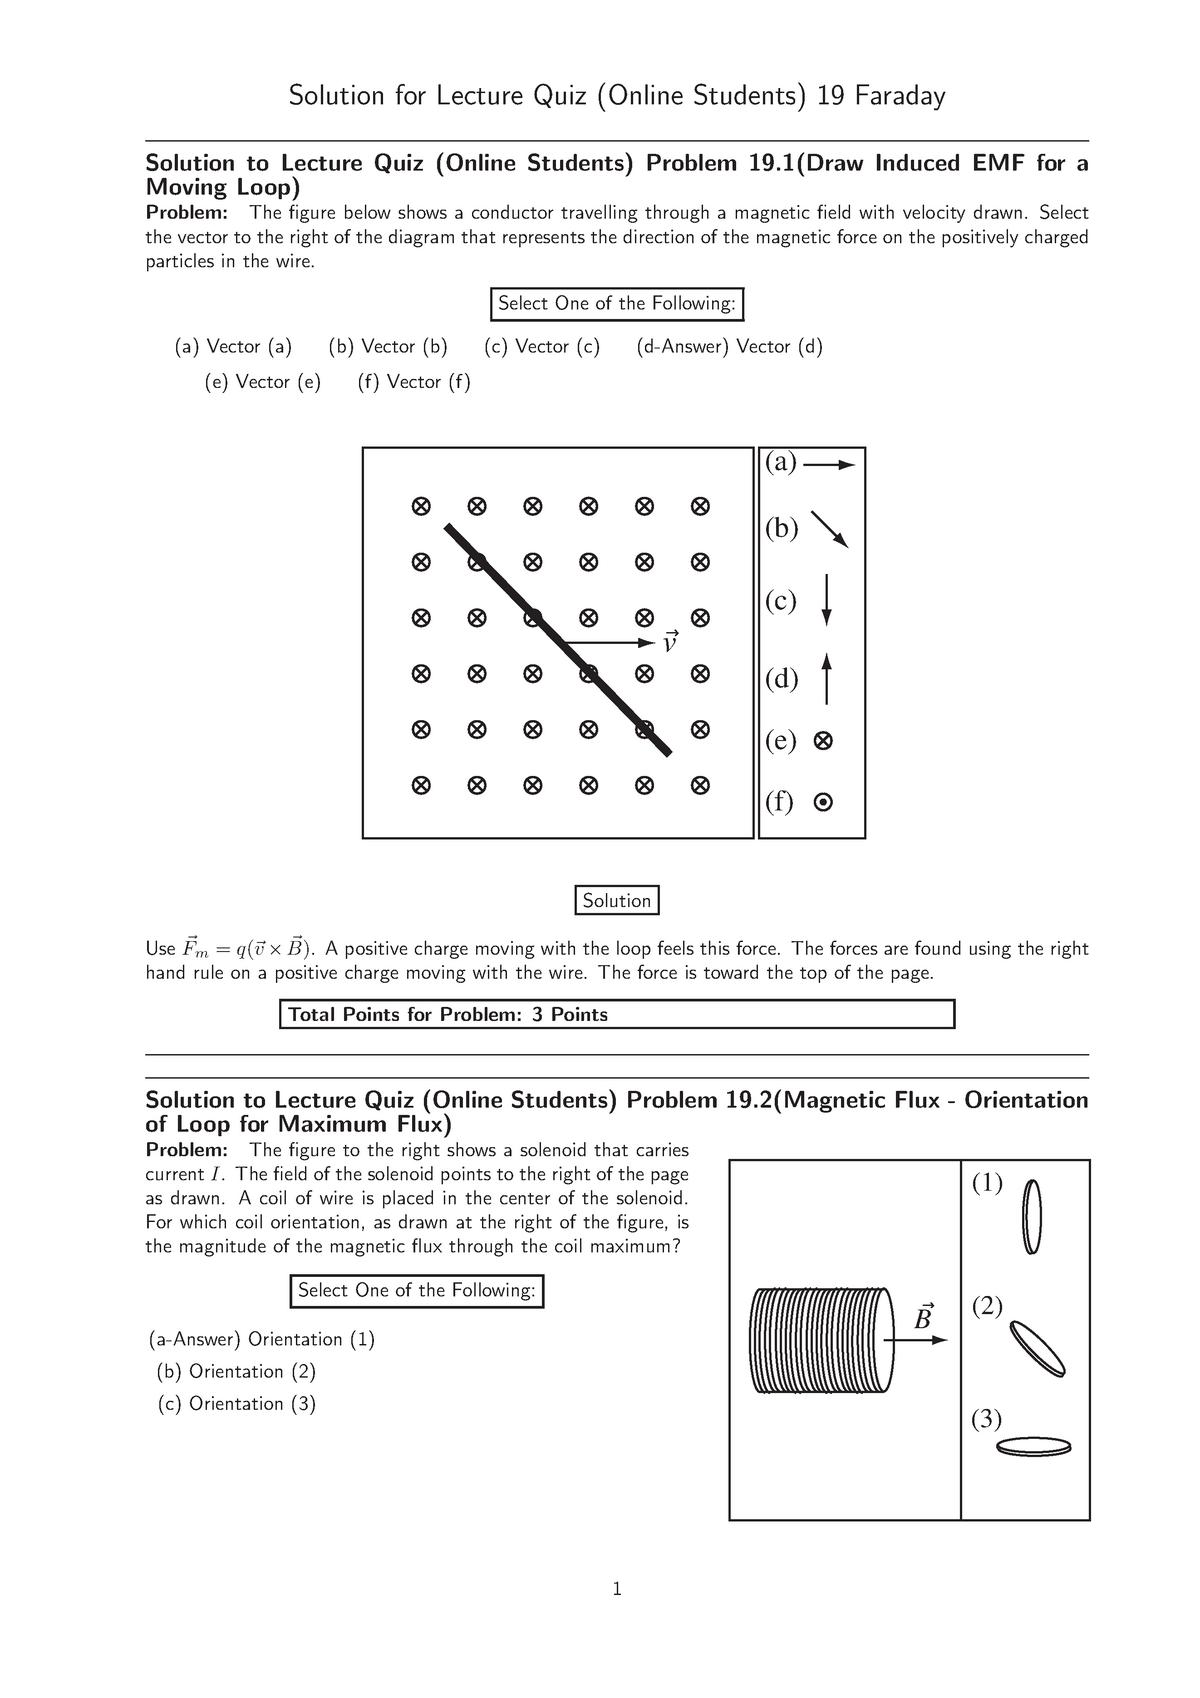 Lecturequiz-19-sln - lecturequiz - PHYS 2074: Univ Physics